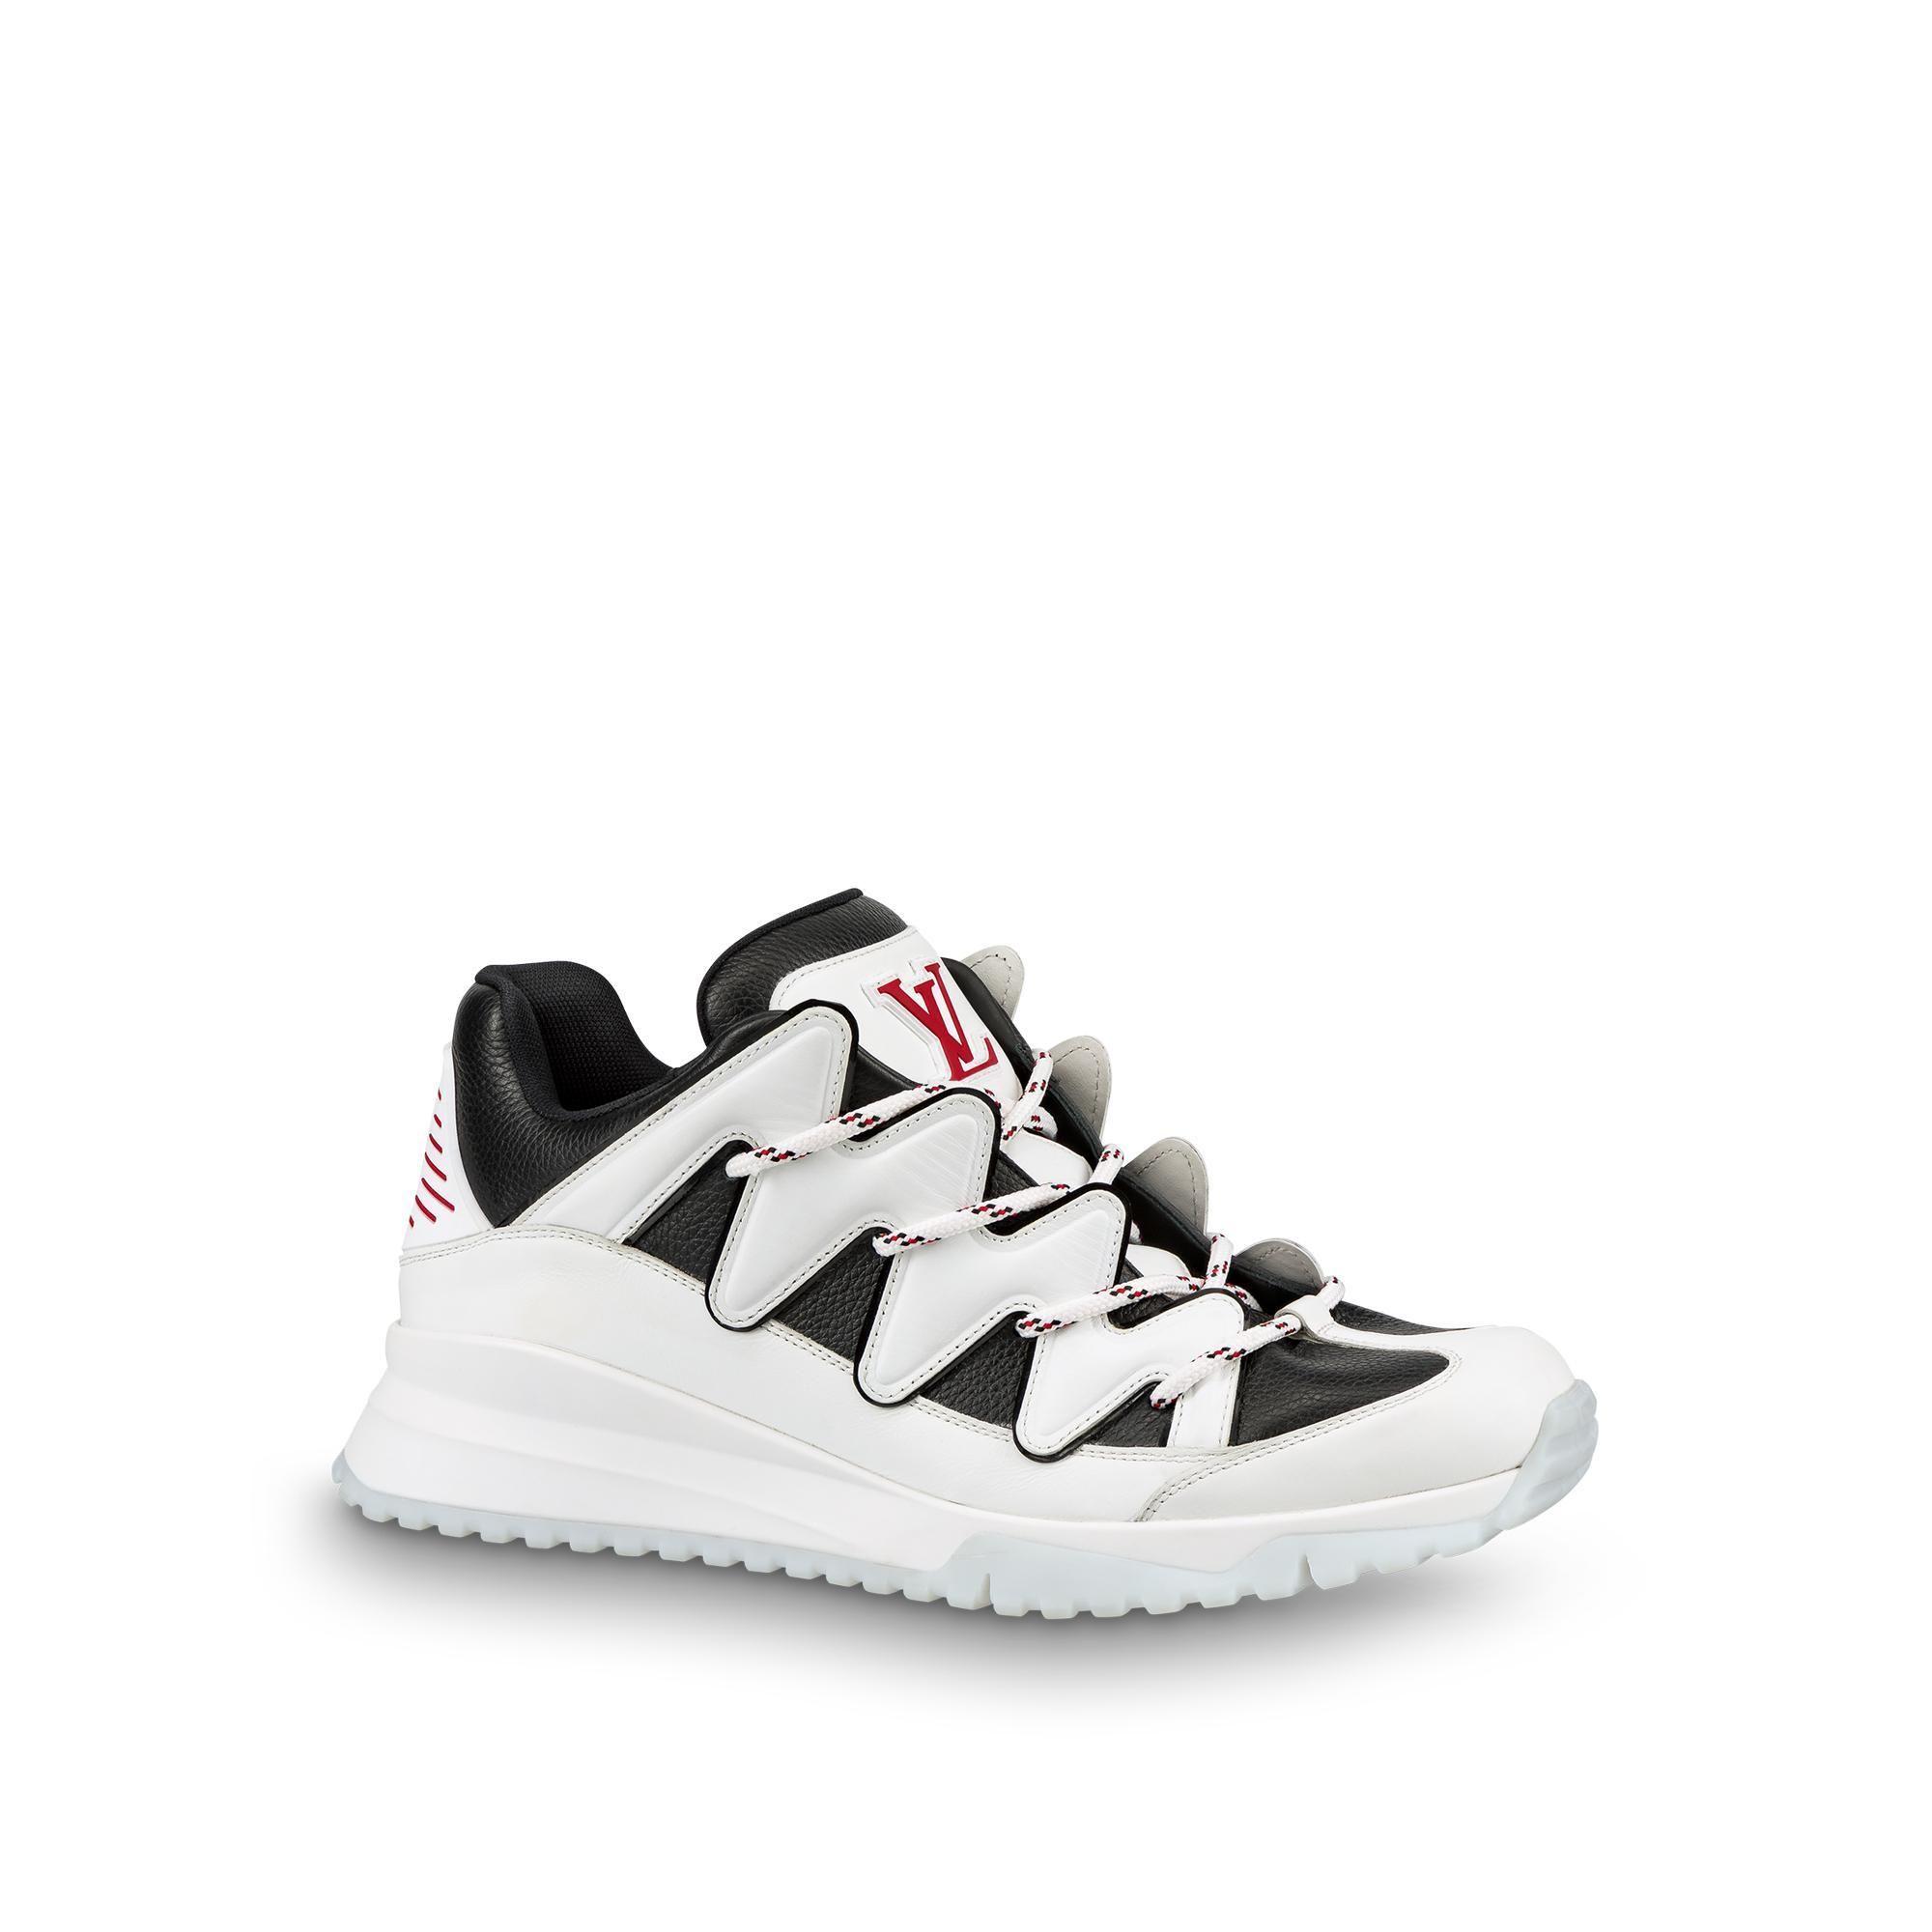 Louis Vuitton Zig Zag Sneaker Louisvuitton Shoes